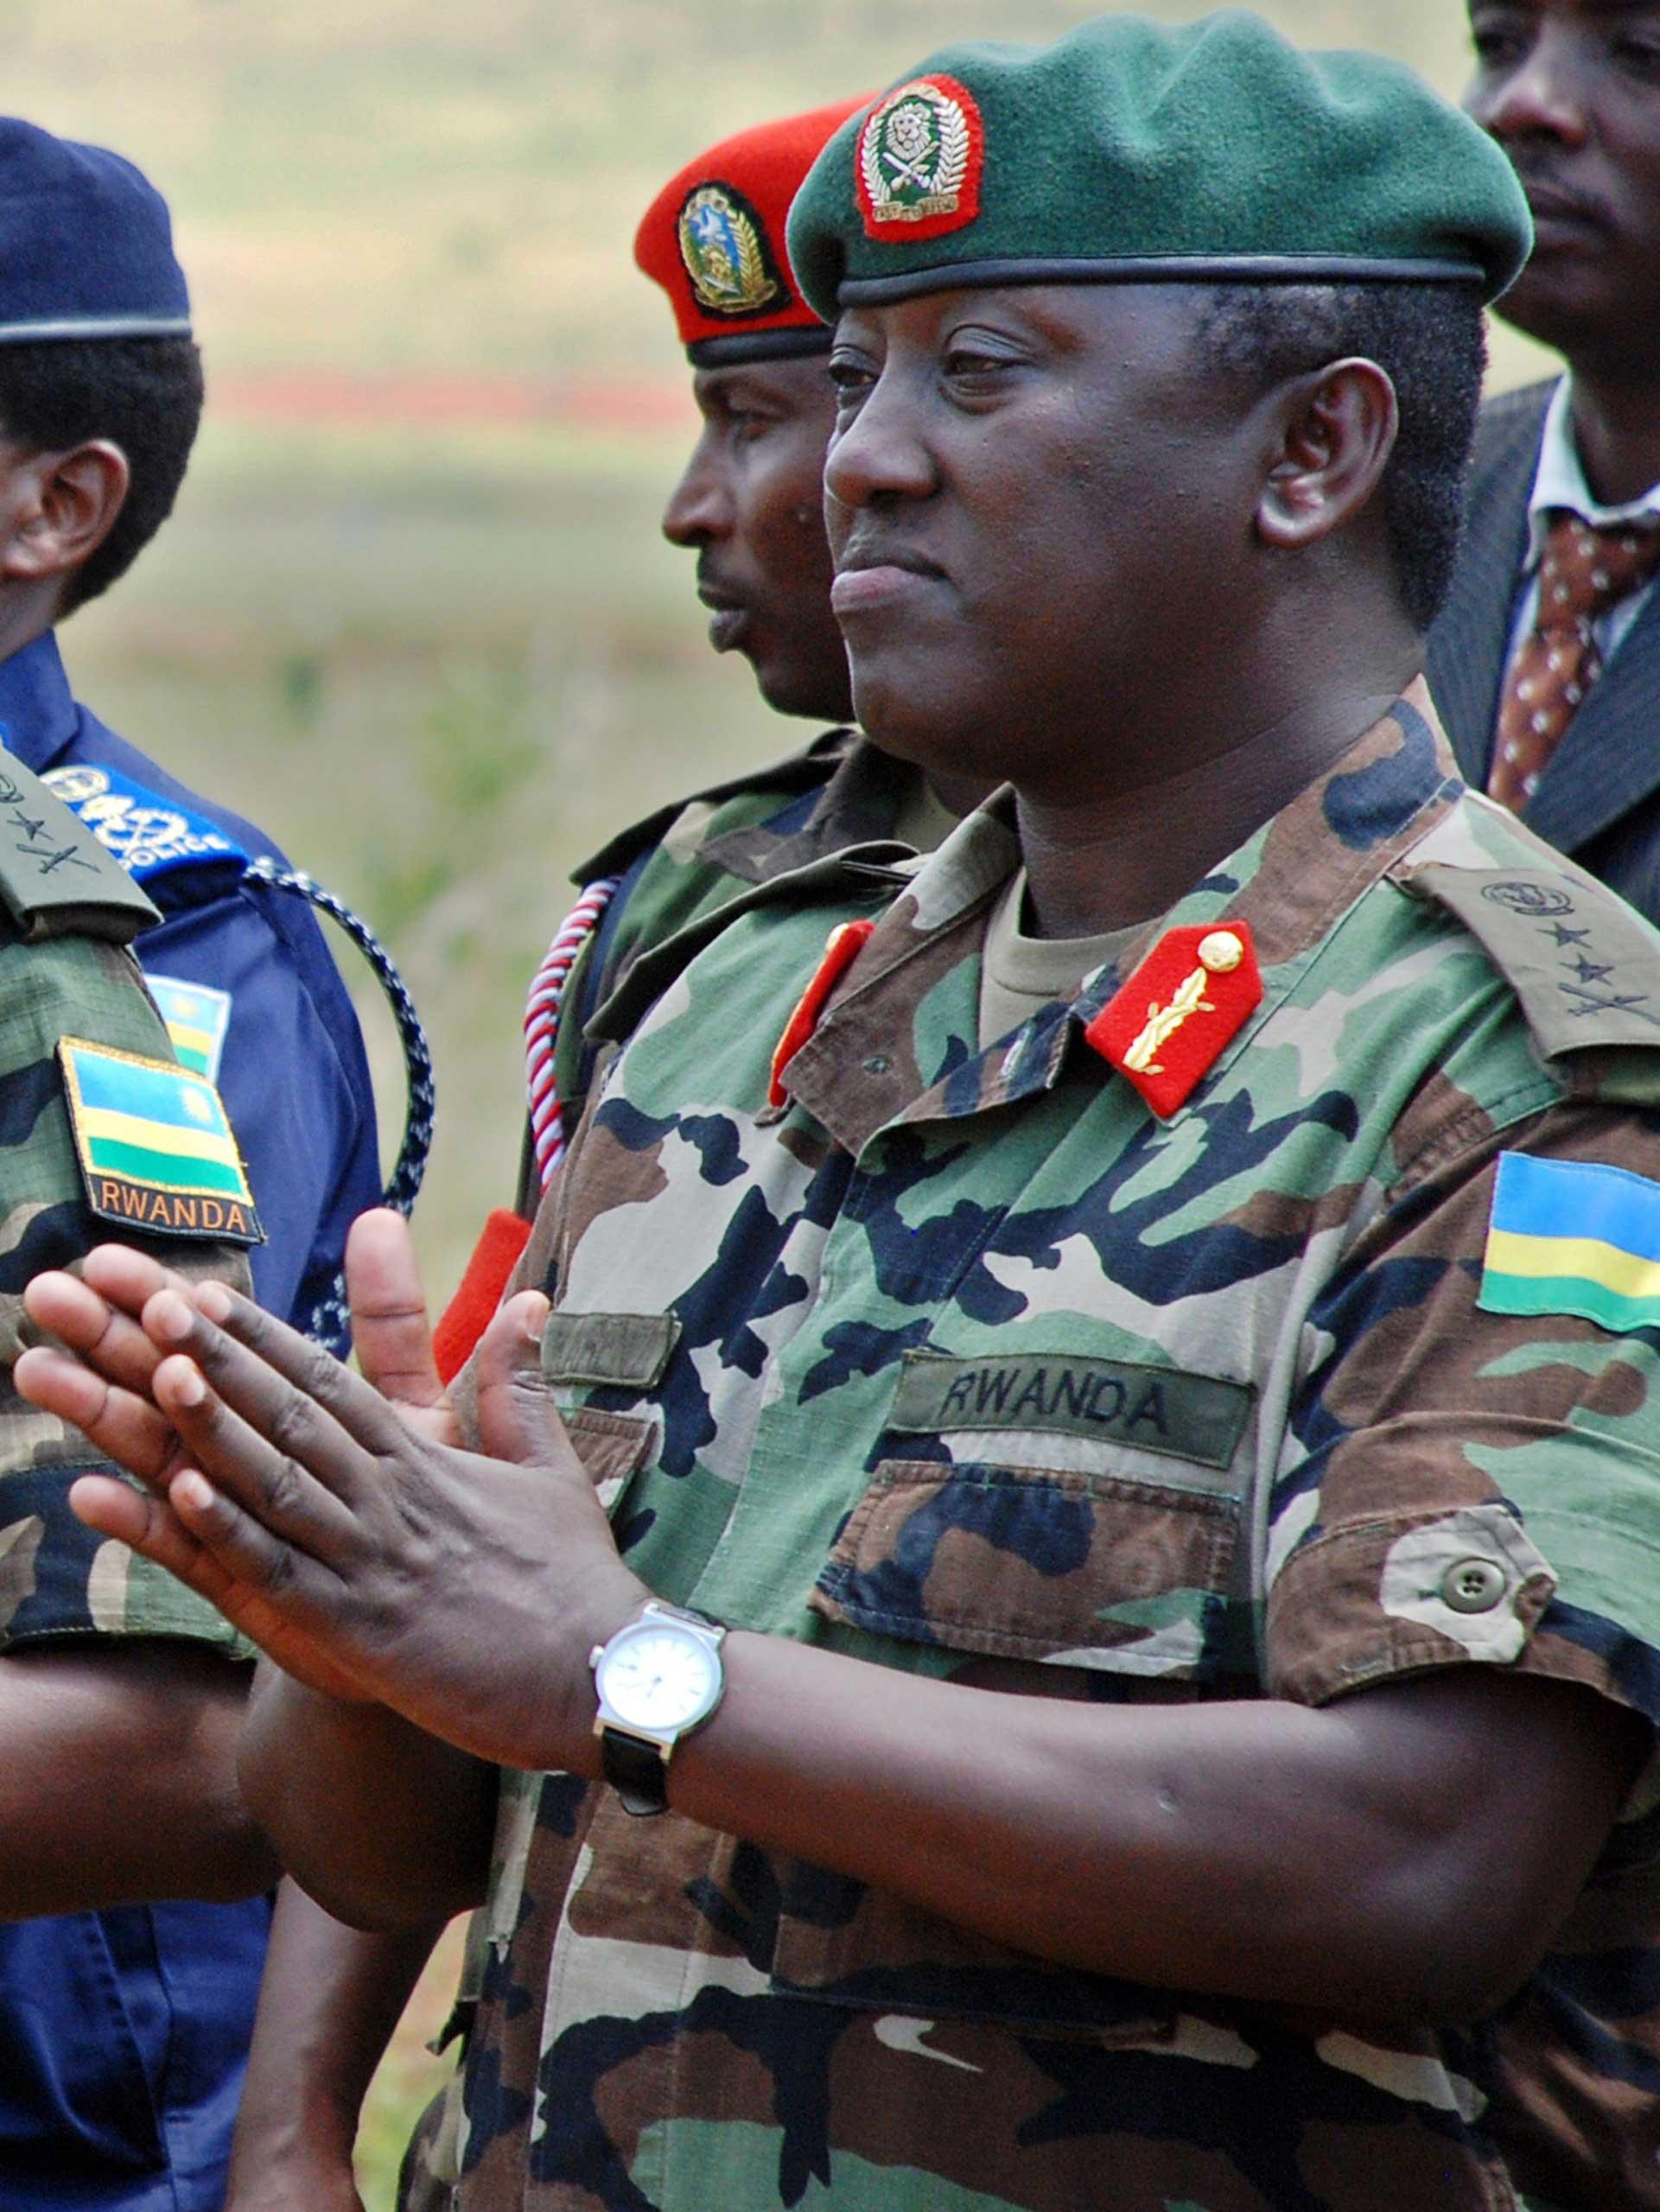 Rwandan Lieutenant General Karenzi Karake at Nasho Military training school in Kirehe District, in Rwanda's Eastern Province, when he was still a major-general, Dec. 17, 2010